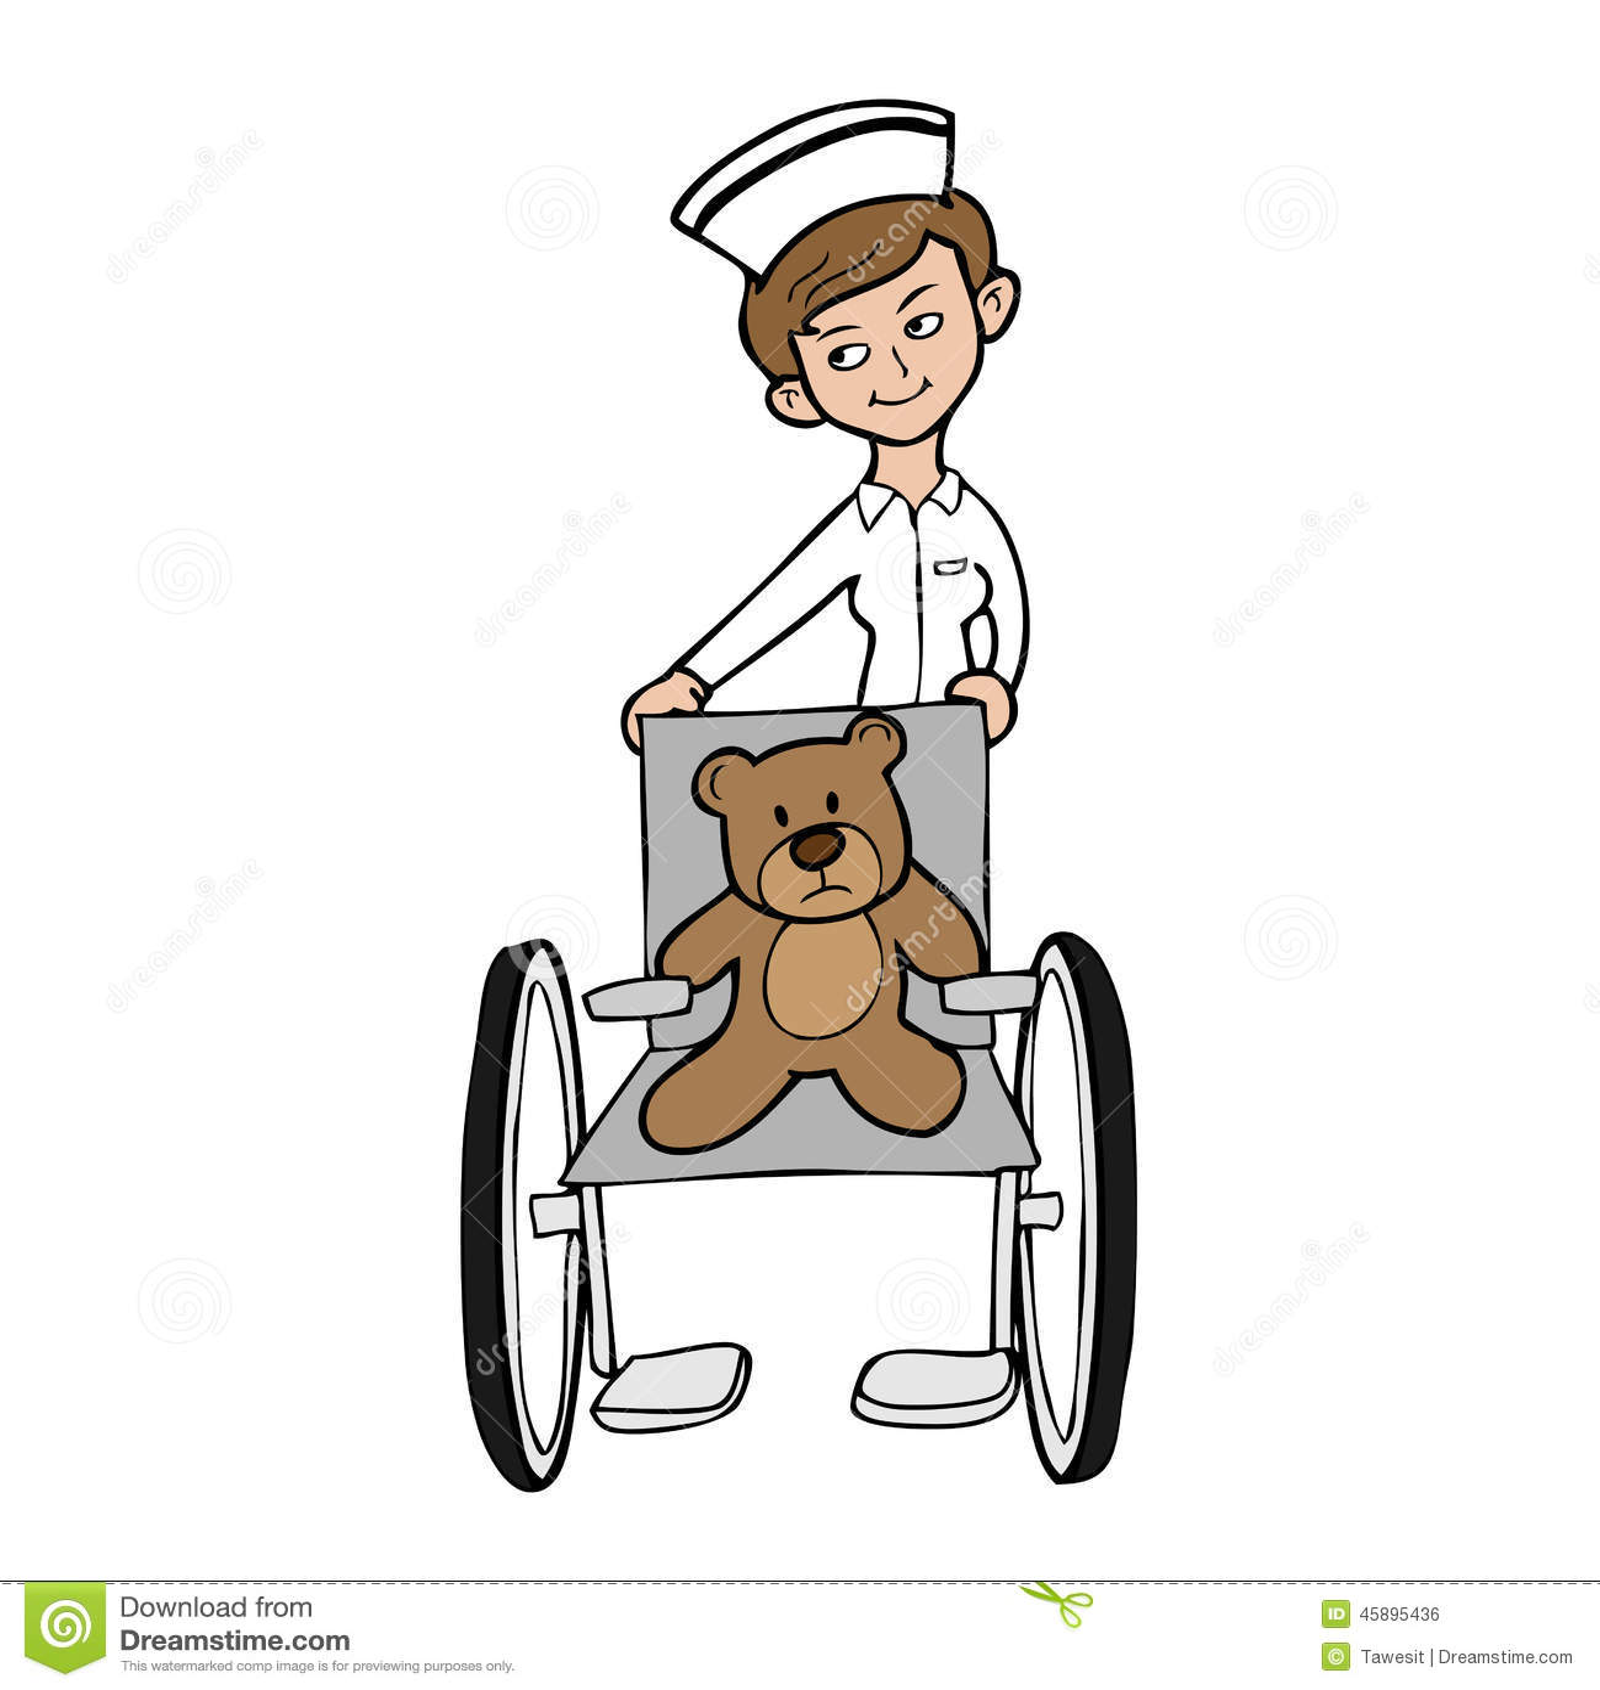 https://thumbs.dreamstime.com/z/nurse-wheel-chair-bear-veterinary-wheelchair-cartoon-45895436.jpg Girl